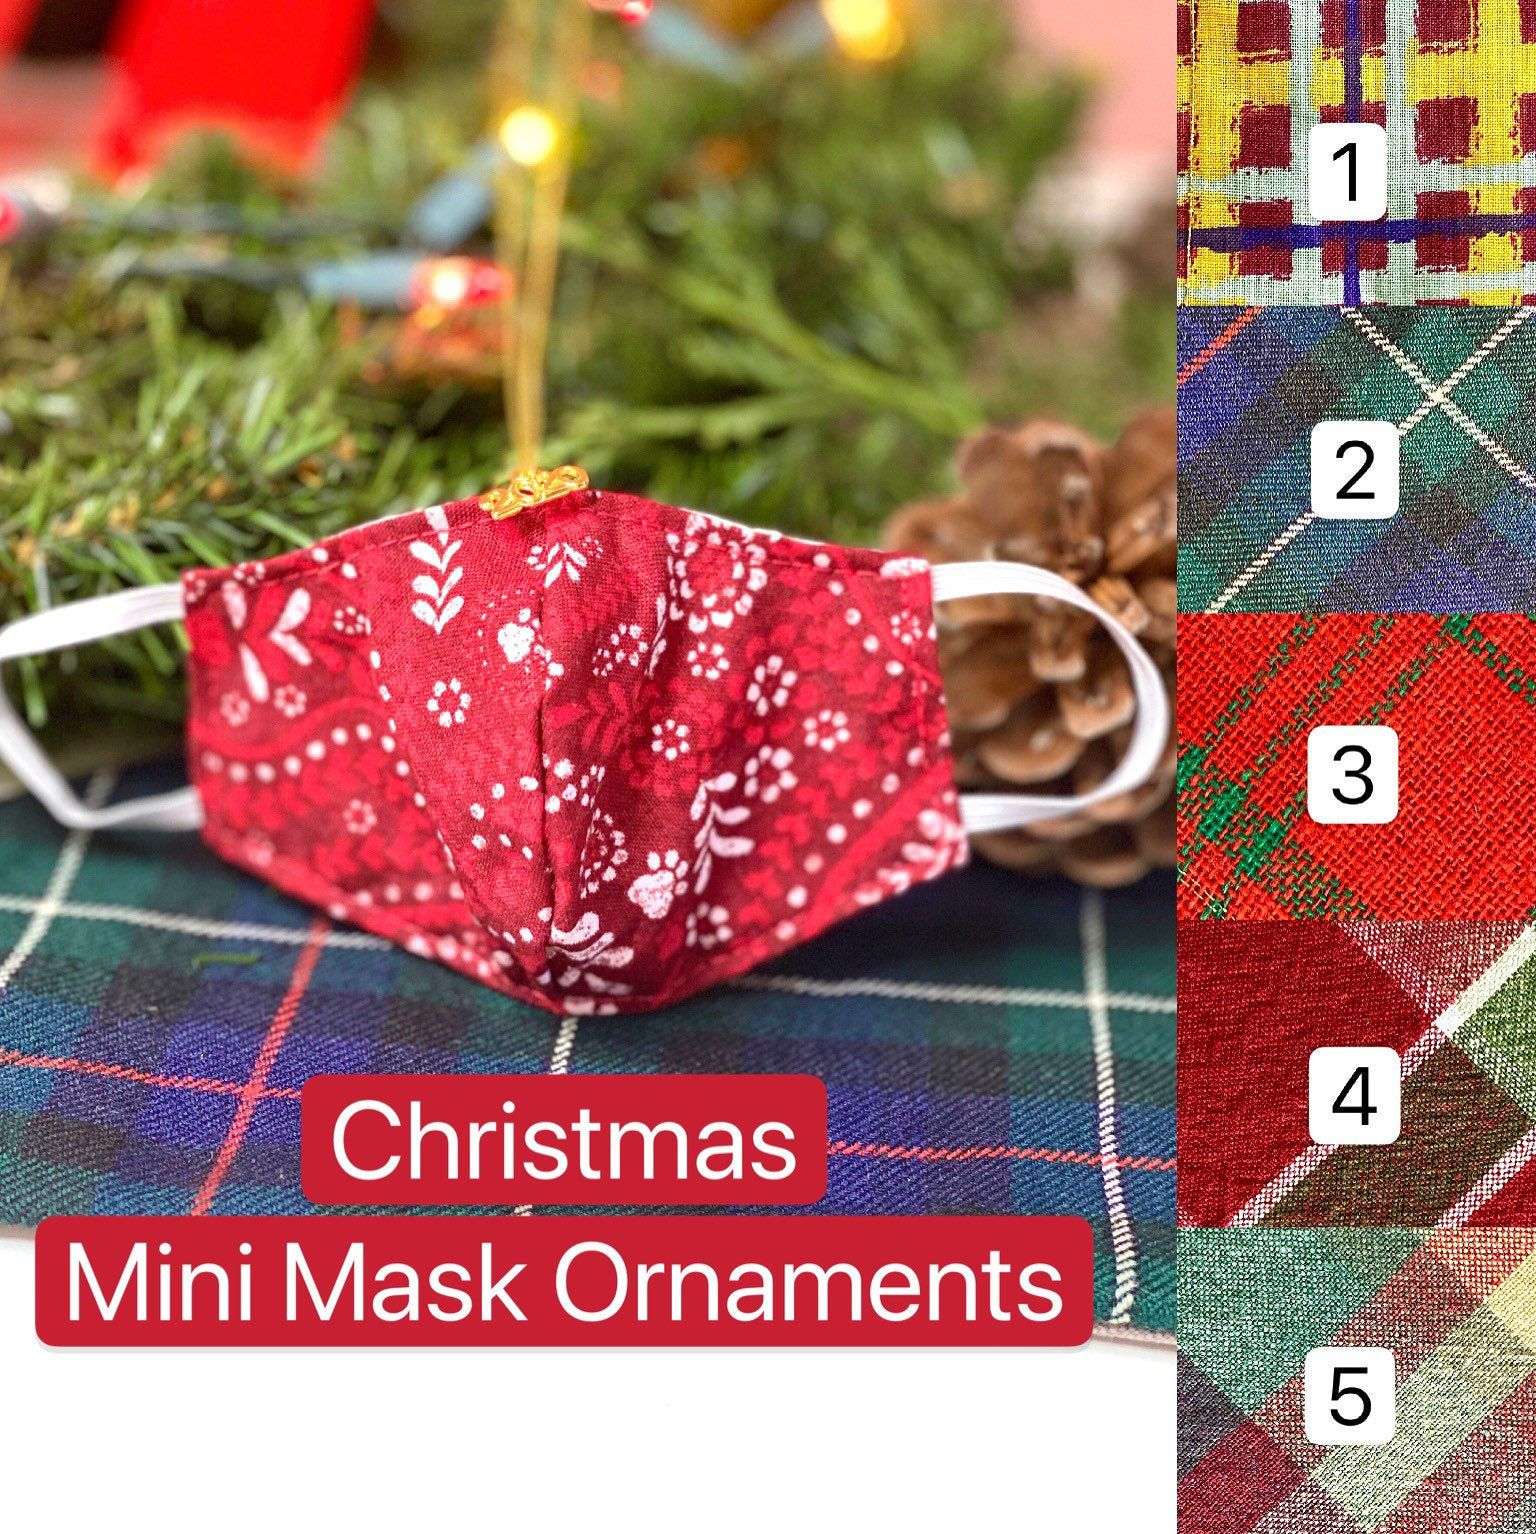 2020 Christmas Mini Face Mask Ornaments Handmade Many Etsy In 2020 Christmas Minis Handmade Ornaments Ornaments